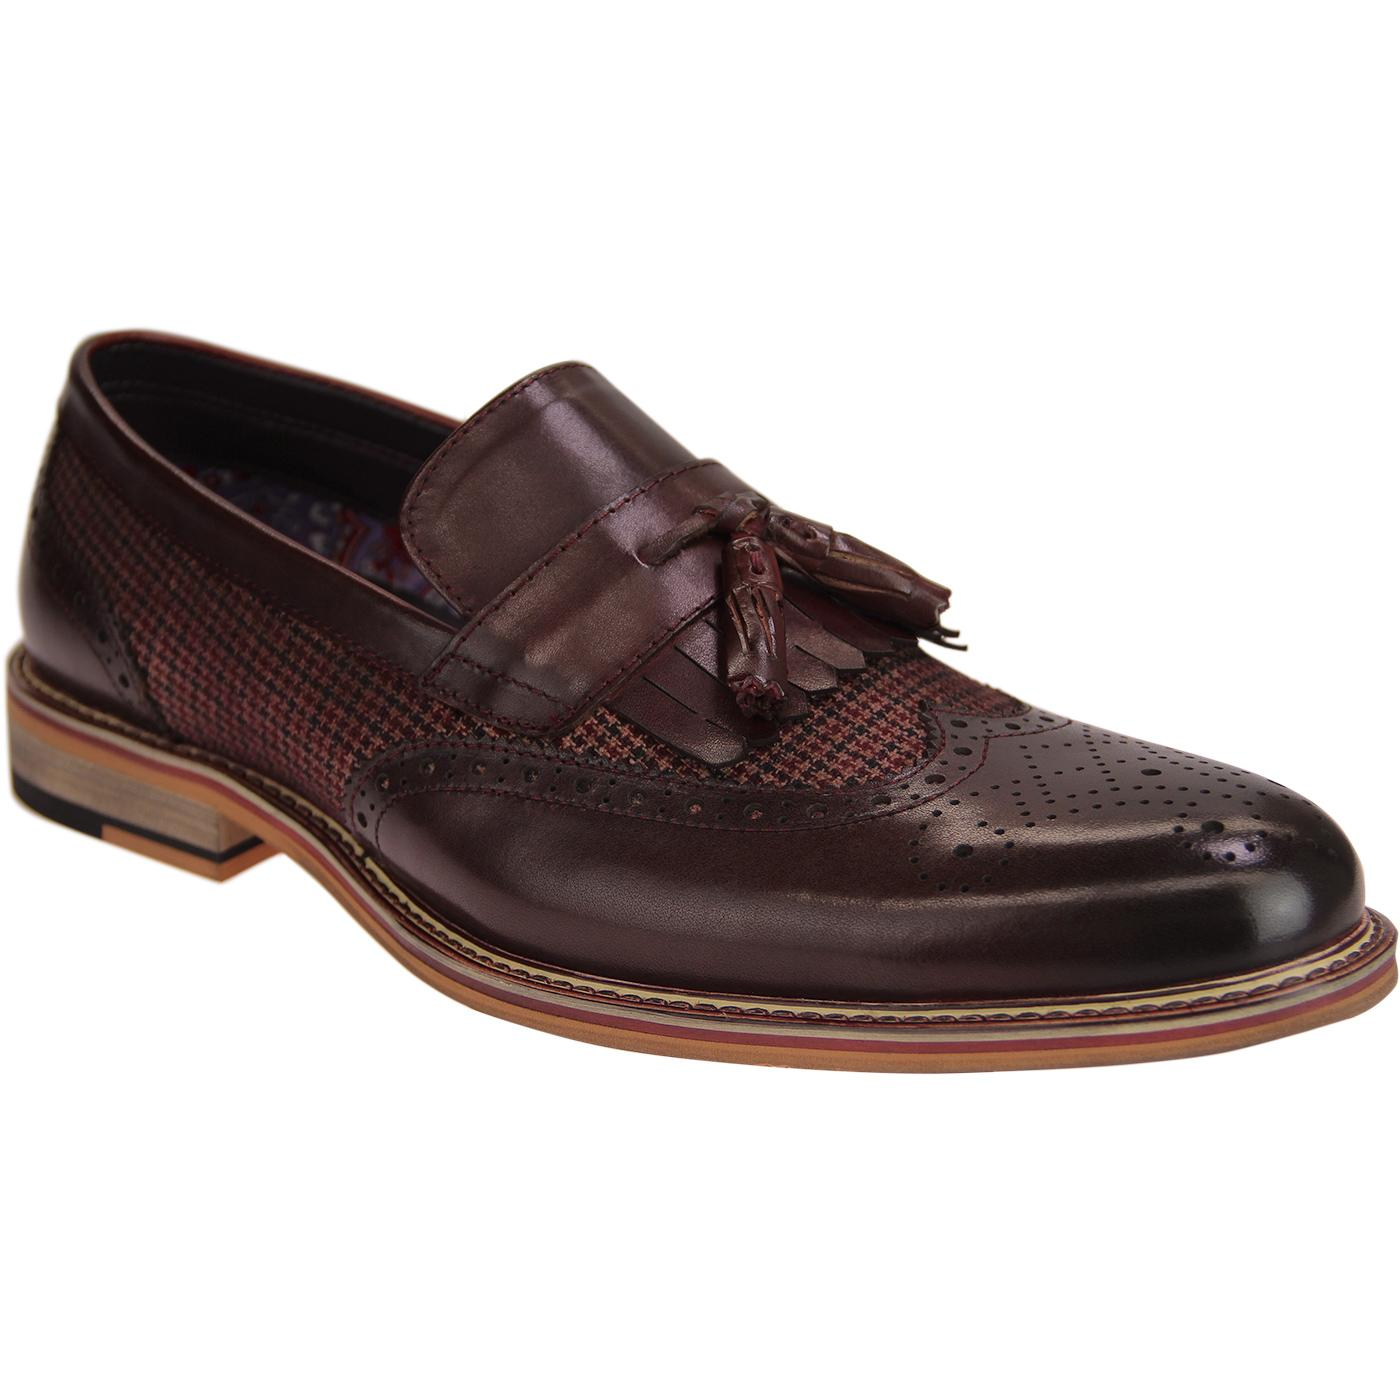 Denali PAOLO VANDINI Mod Dogtooth Tassel Loafers